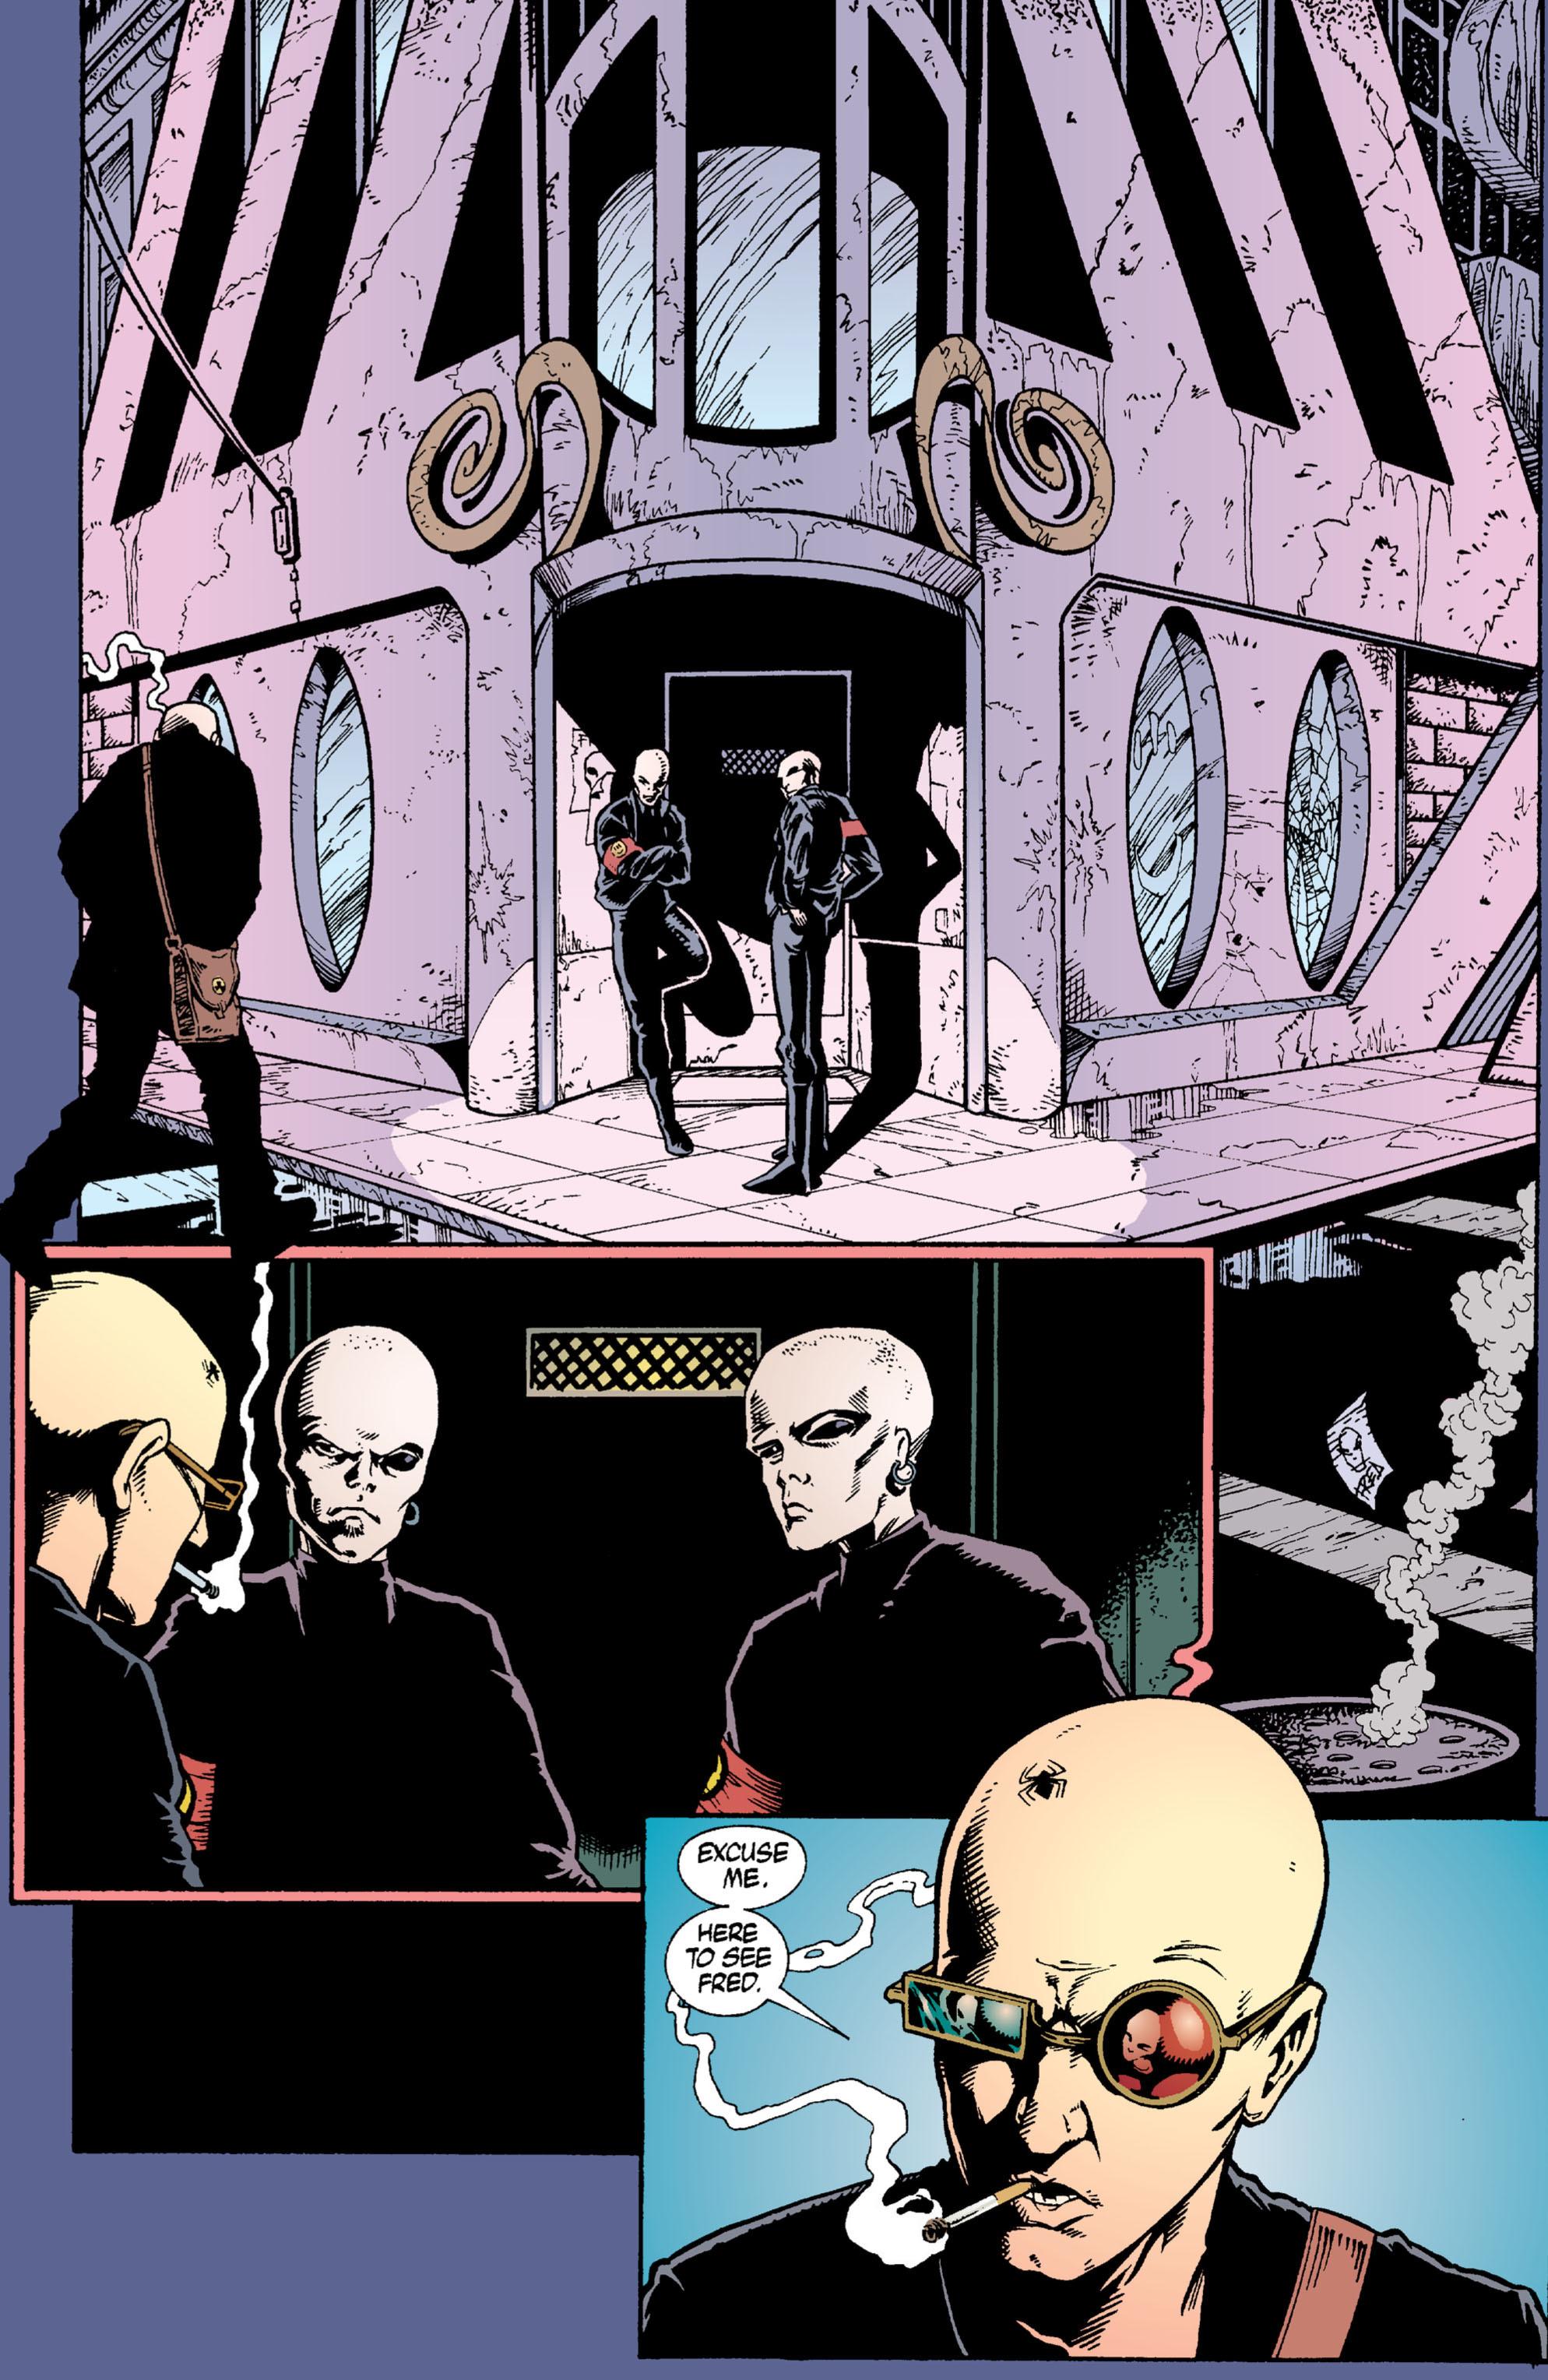 Read online Transmetropolitan comic -  Issue #2 - 8